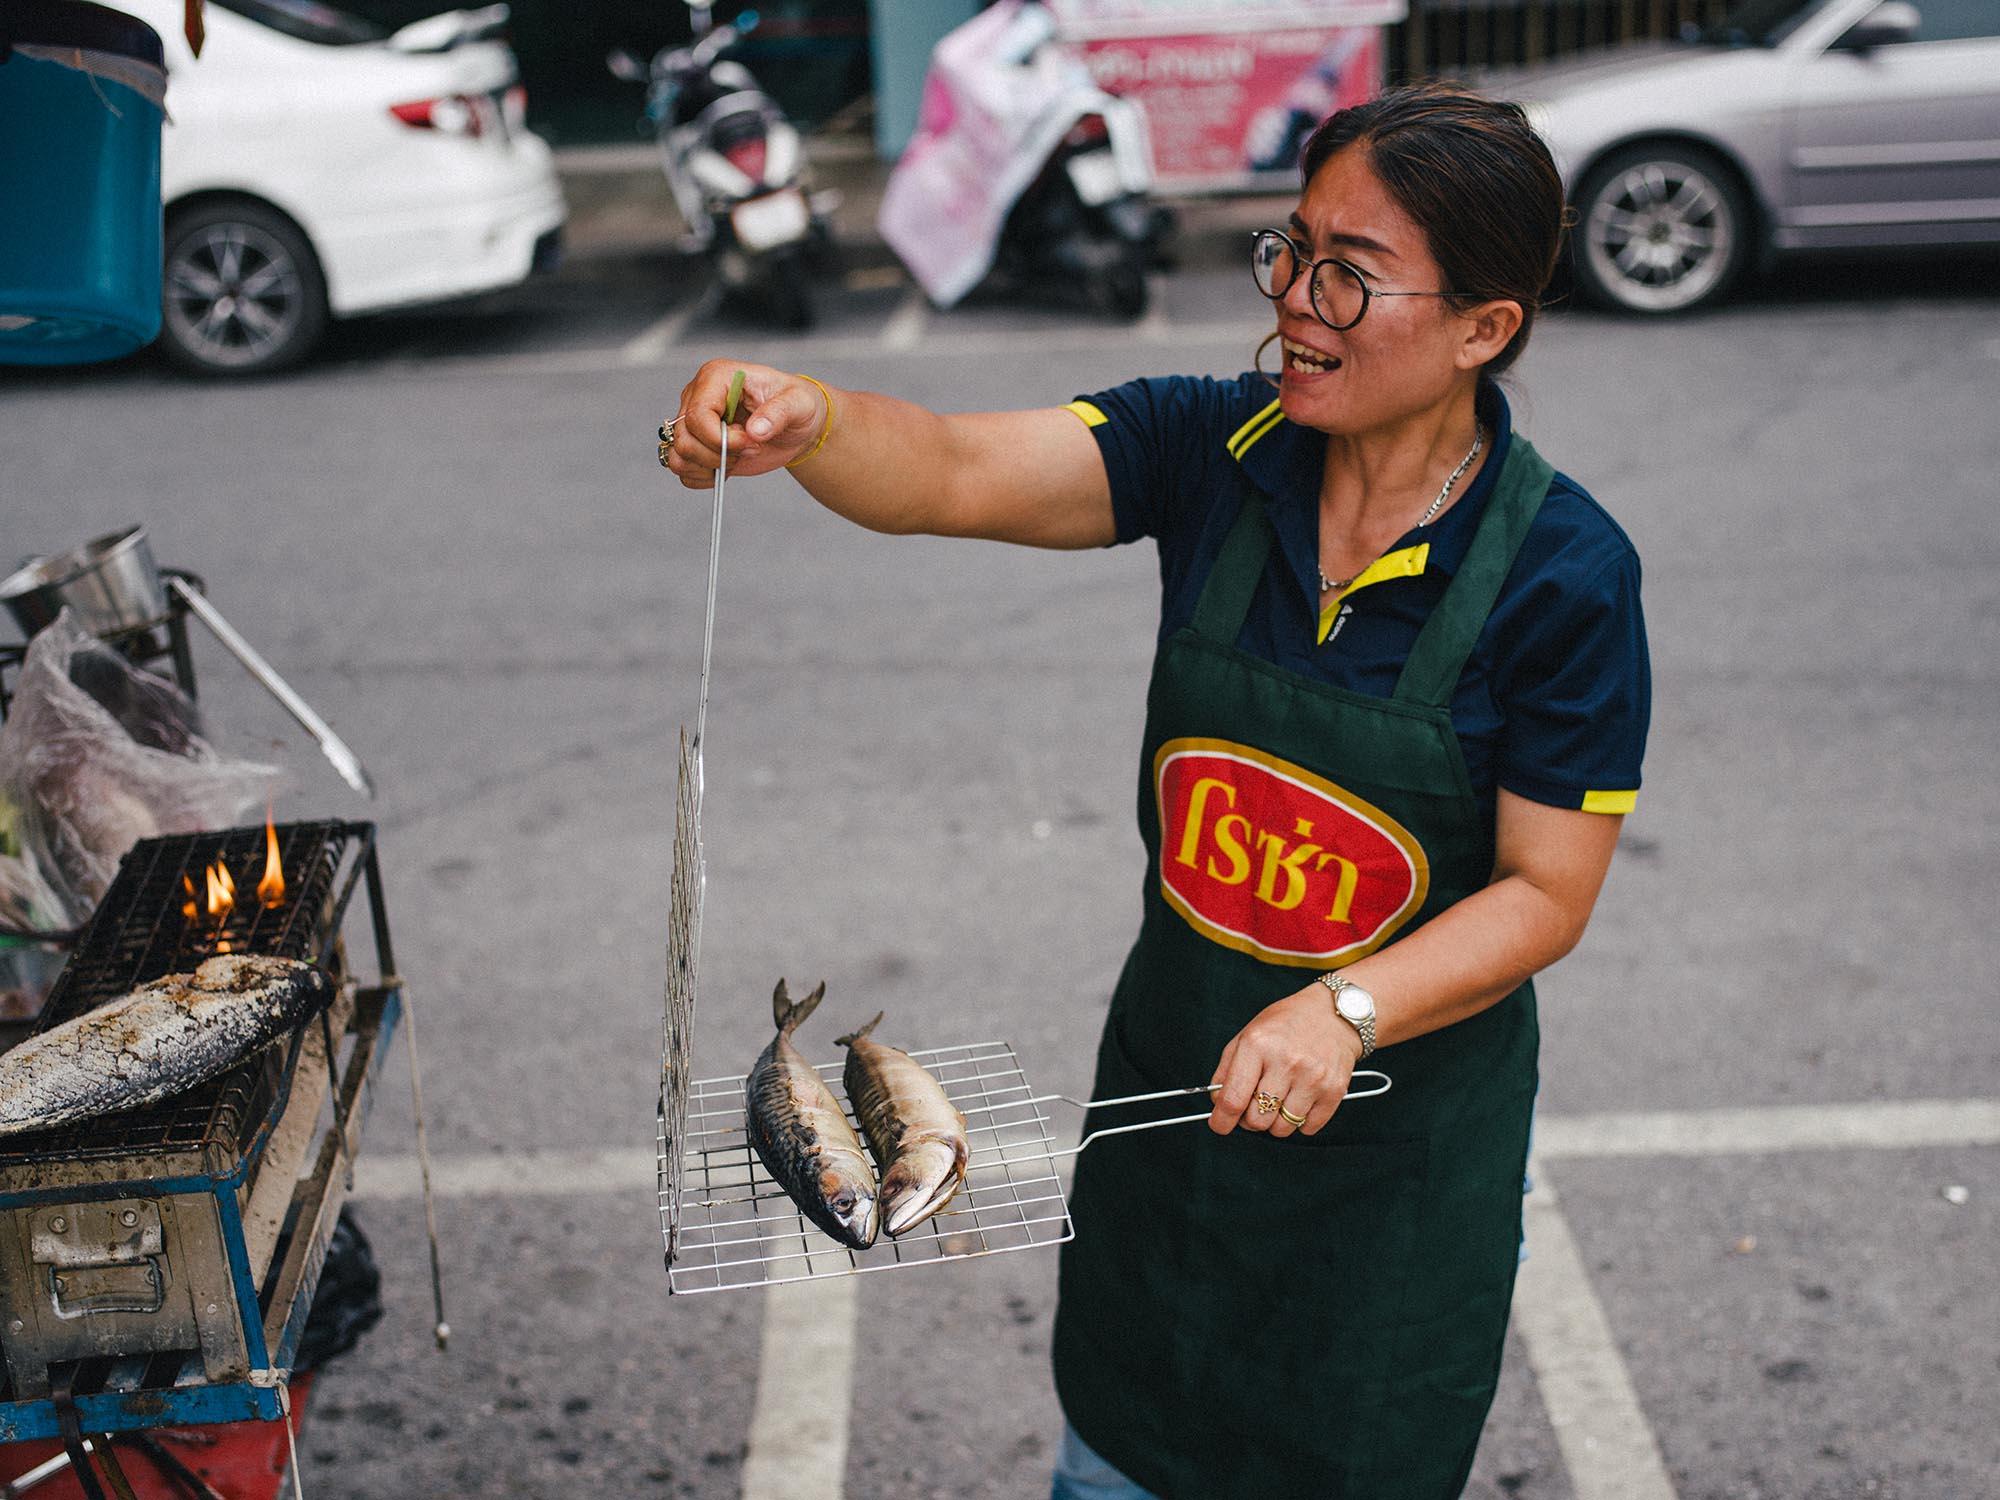 Selling fish.